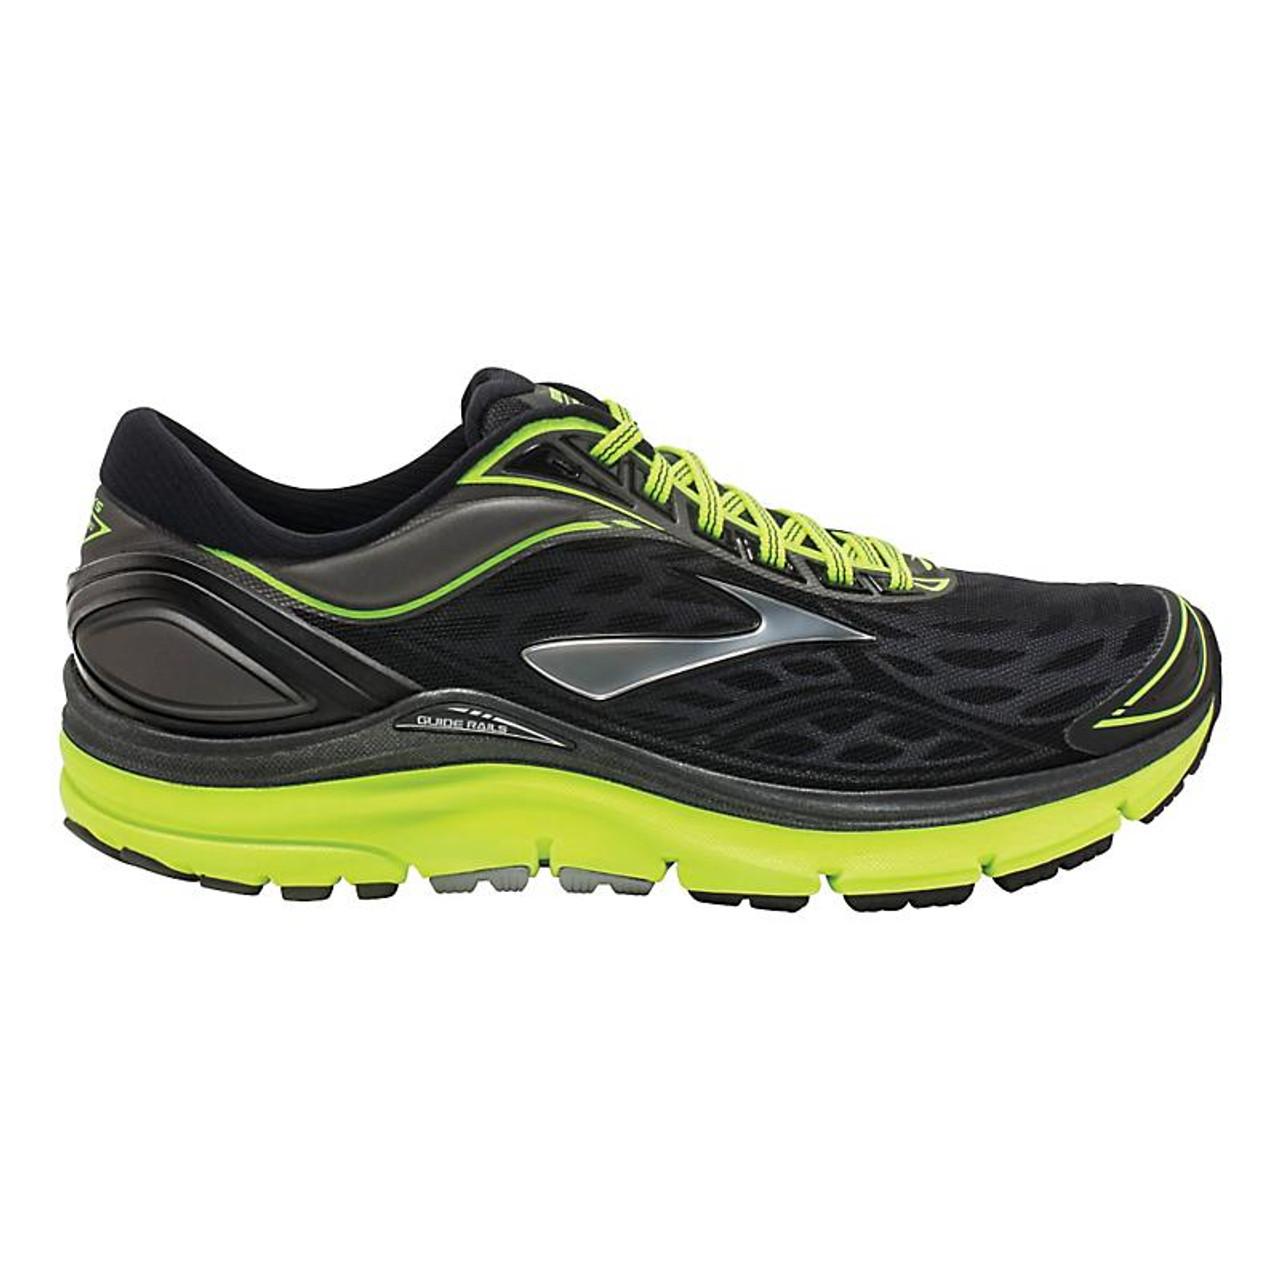 4aefe1573e8 Home · Footwear · Men s Brooks Transcend 3. Sale